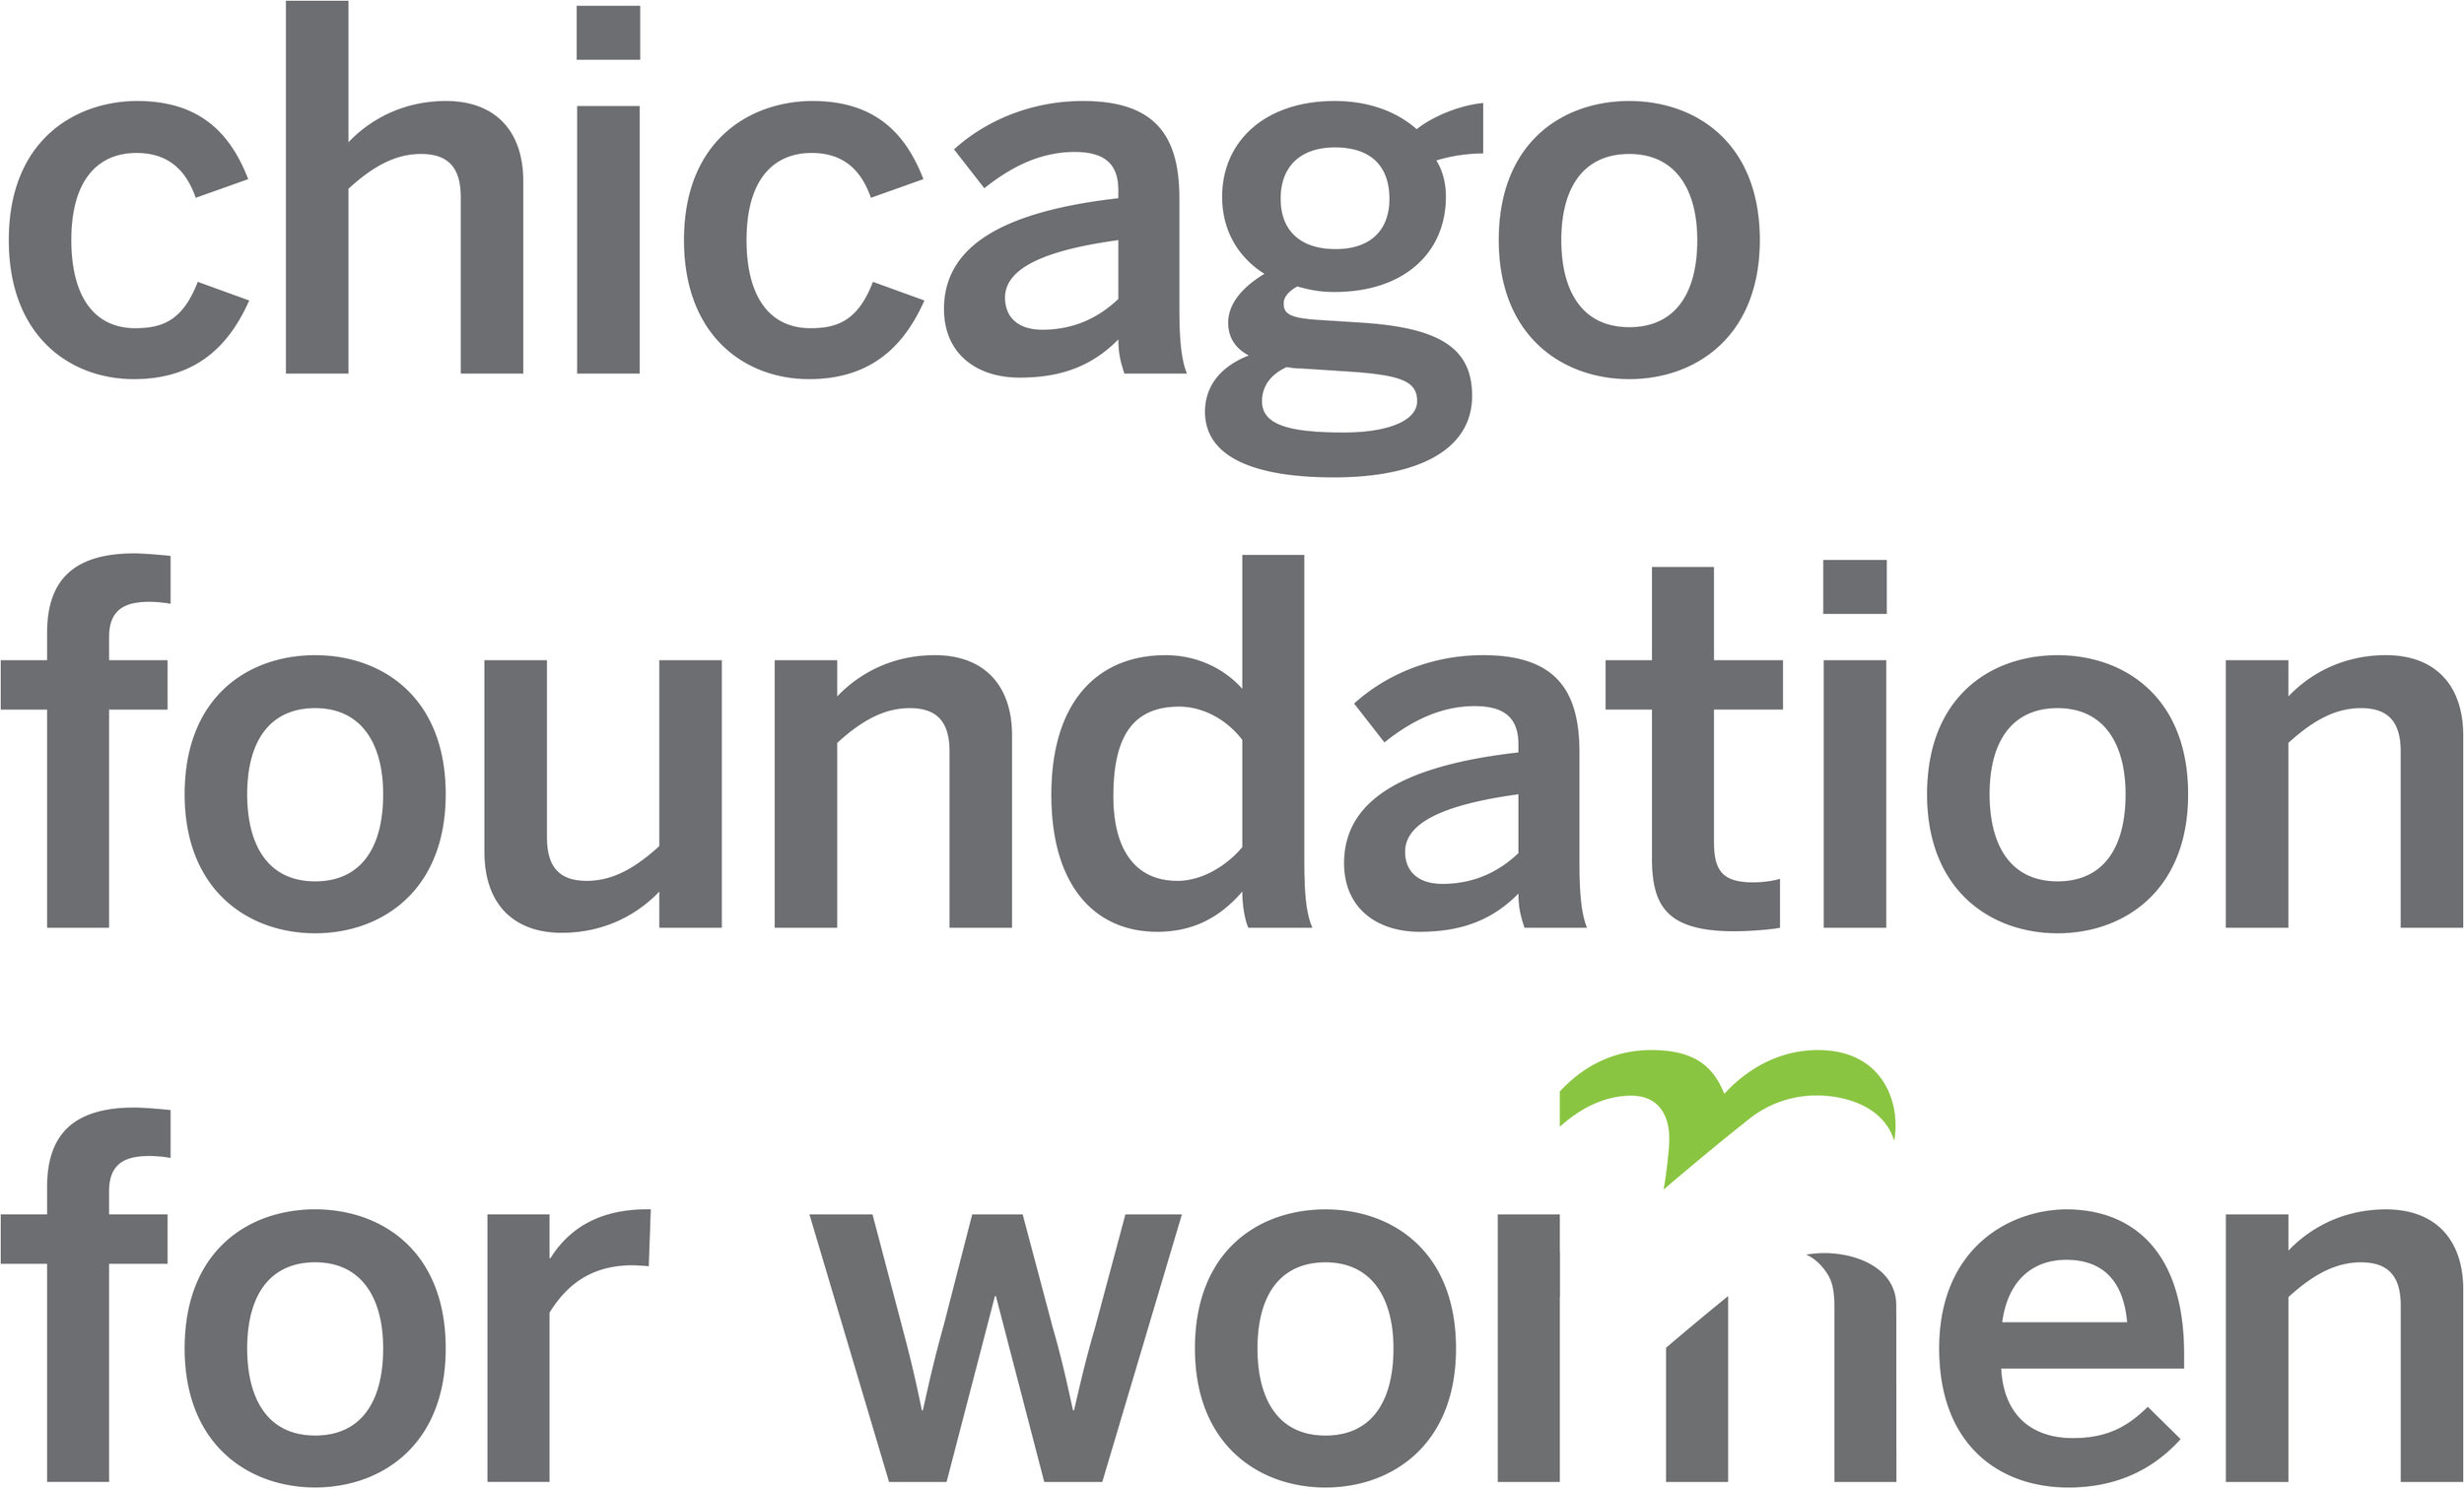 CFW_Rebrand_Logo Design_Standard_web_L.01.jpg